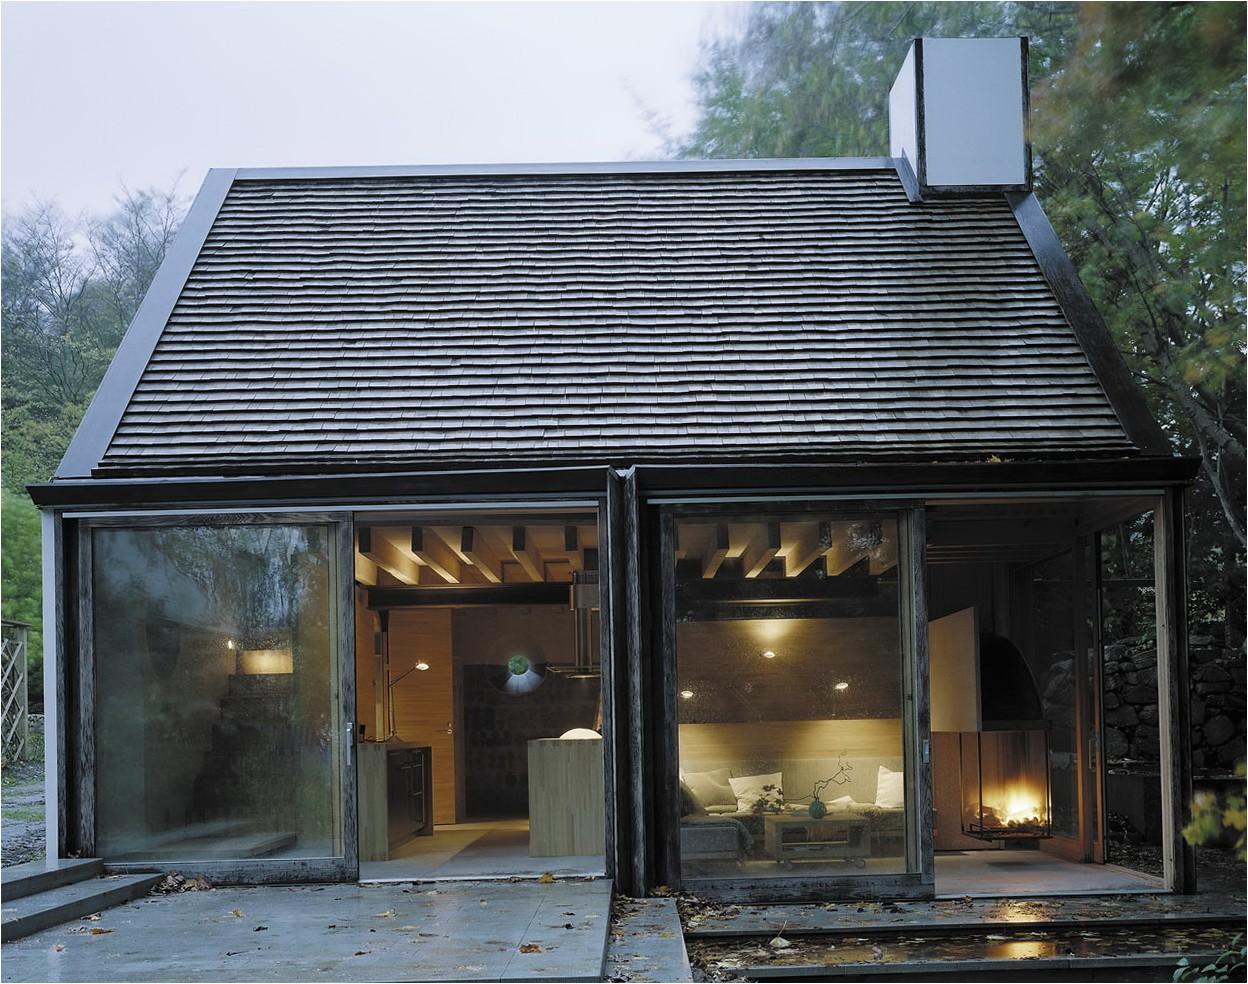 little cozy home in sweden